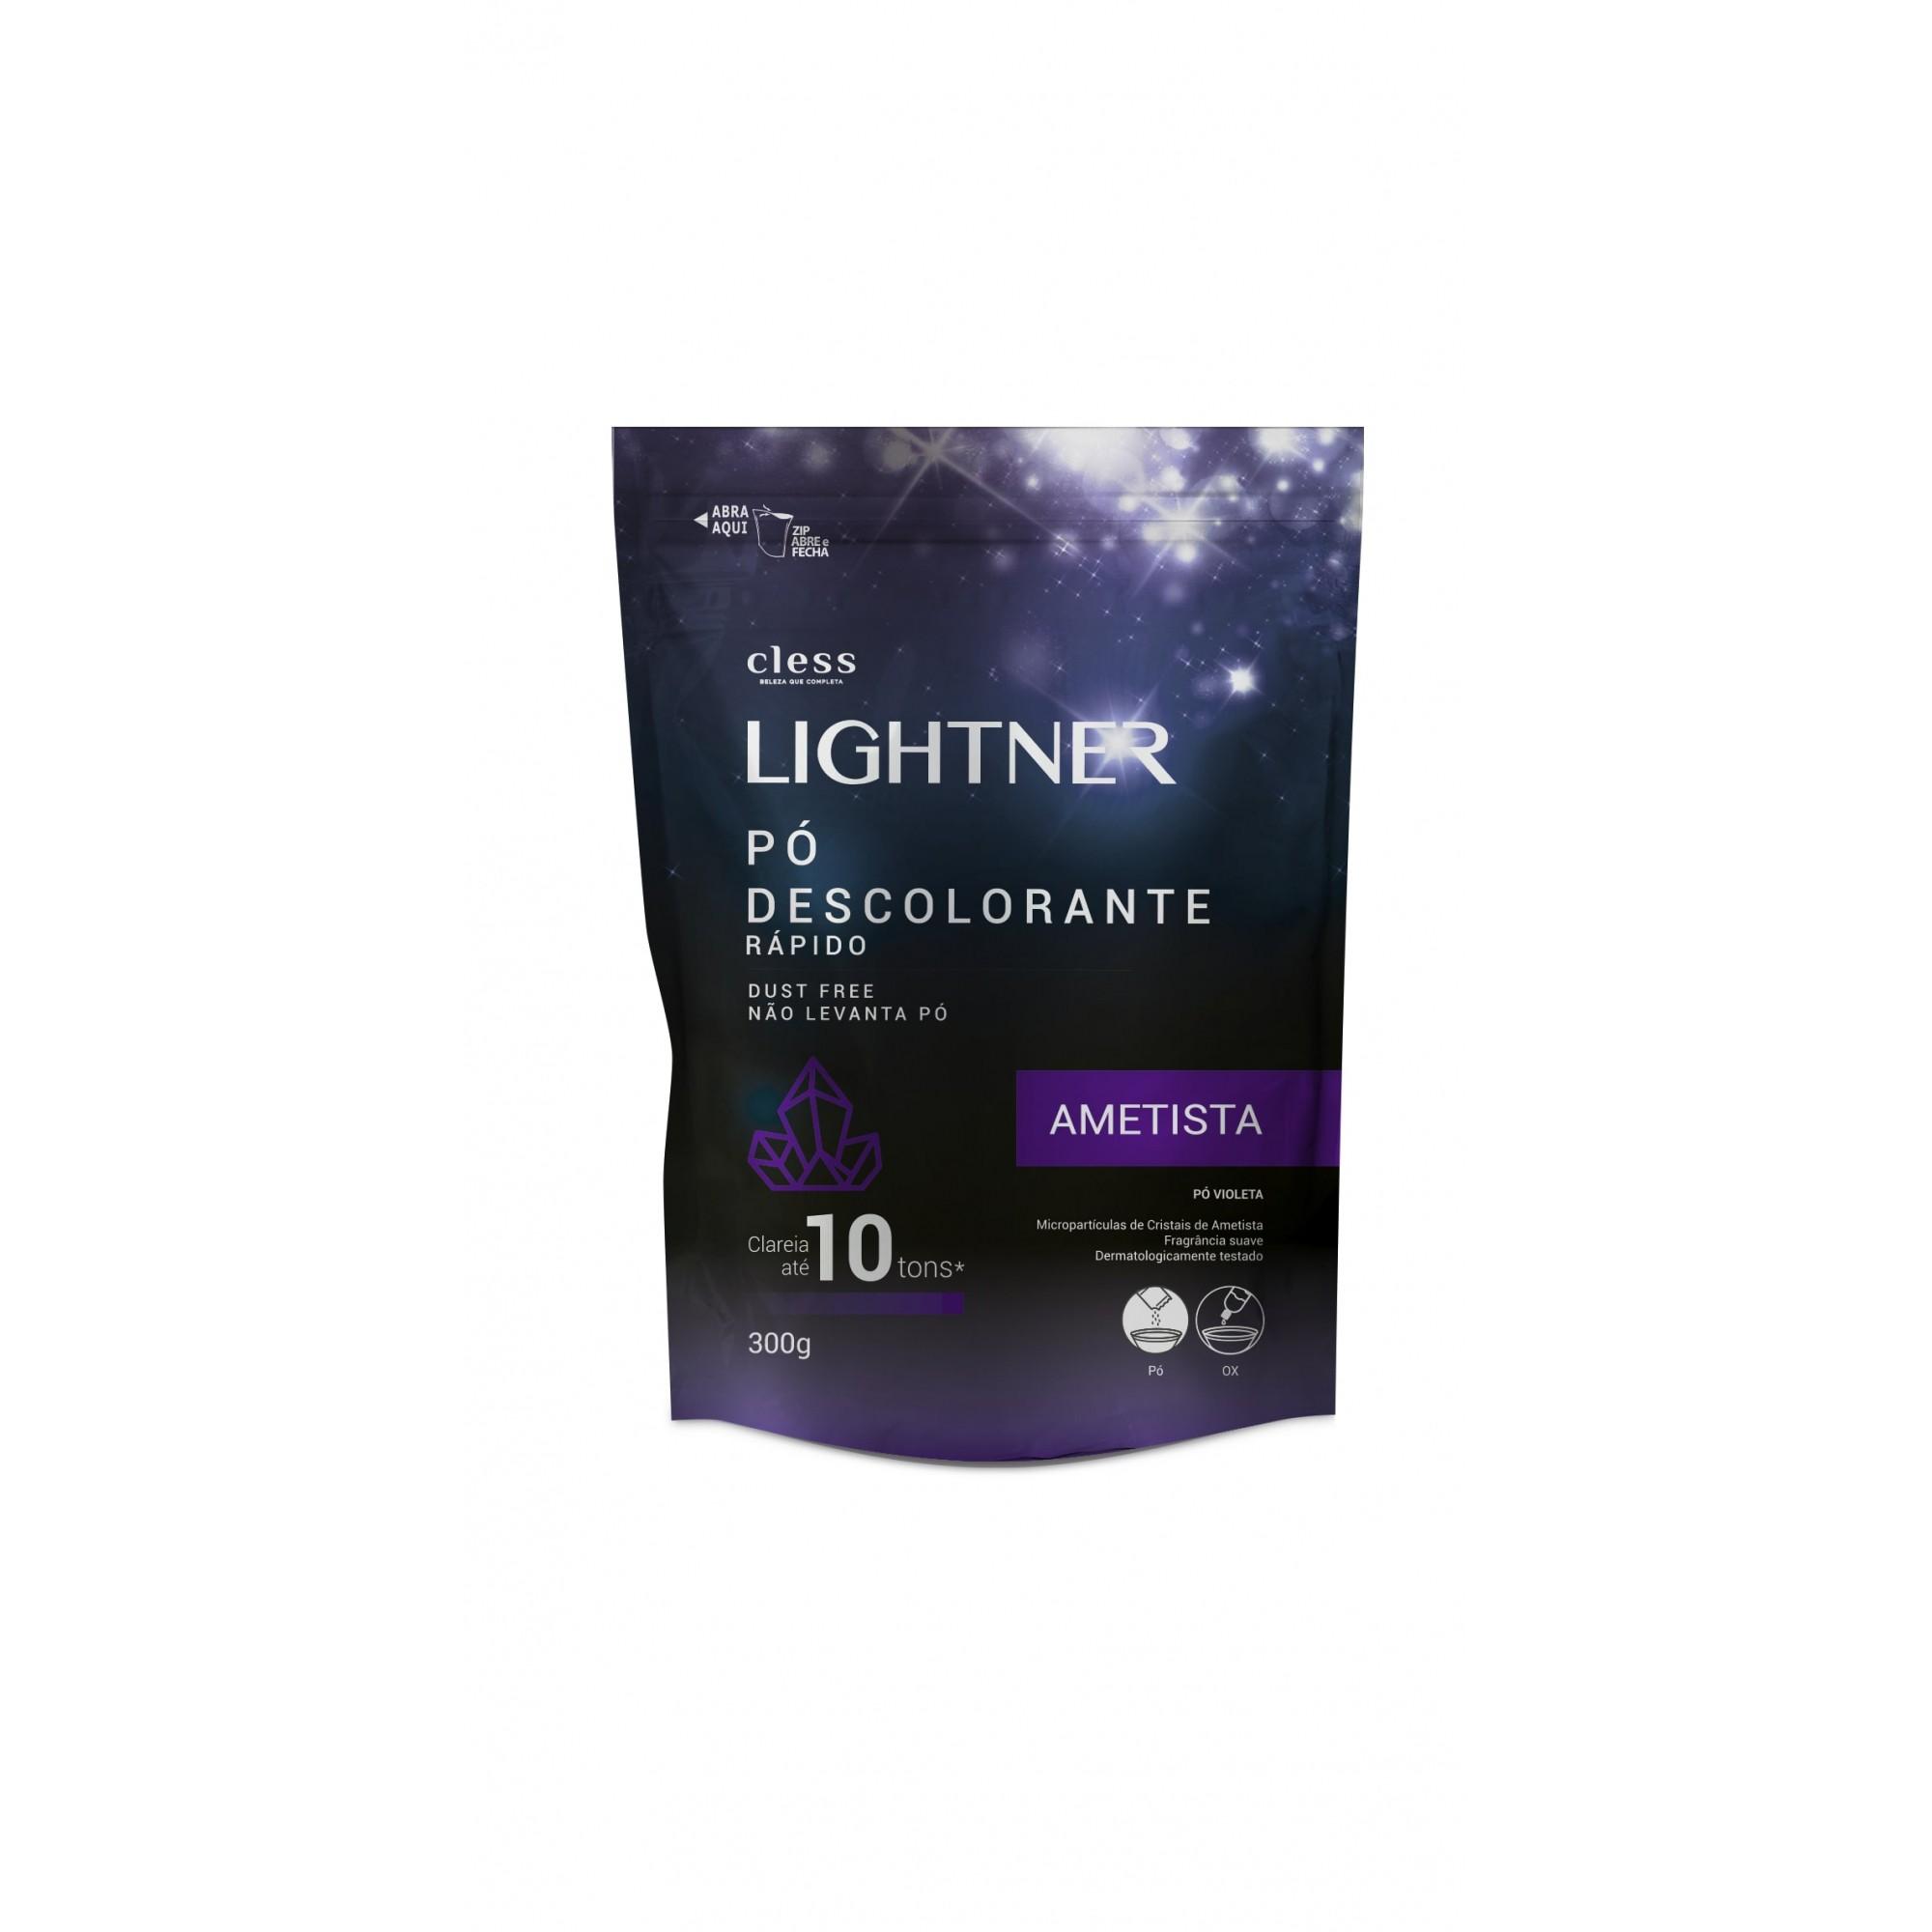 DESCOLORANTE LIGHTNER PO 300G AMETISTA